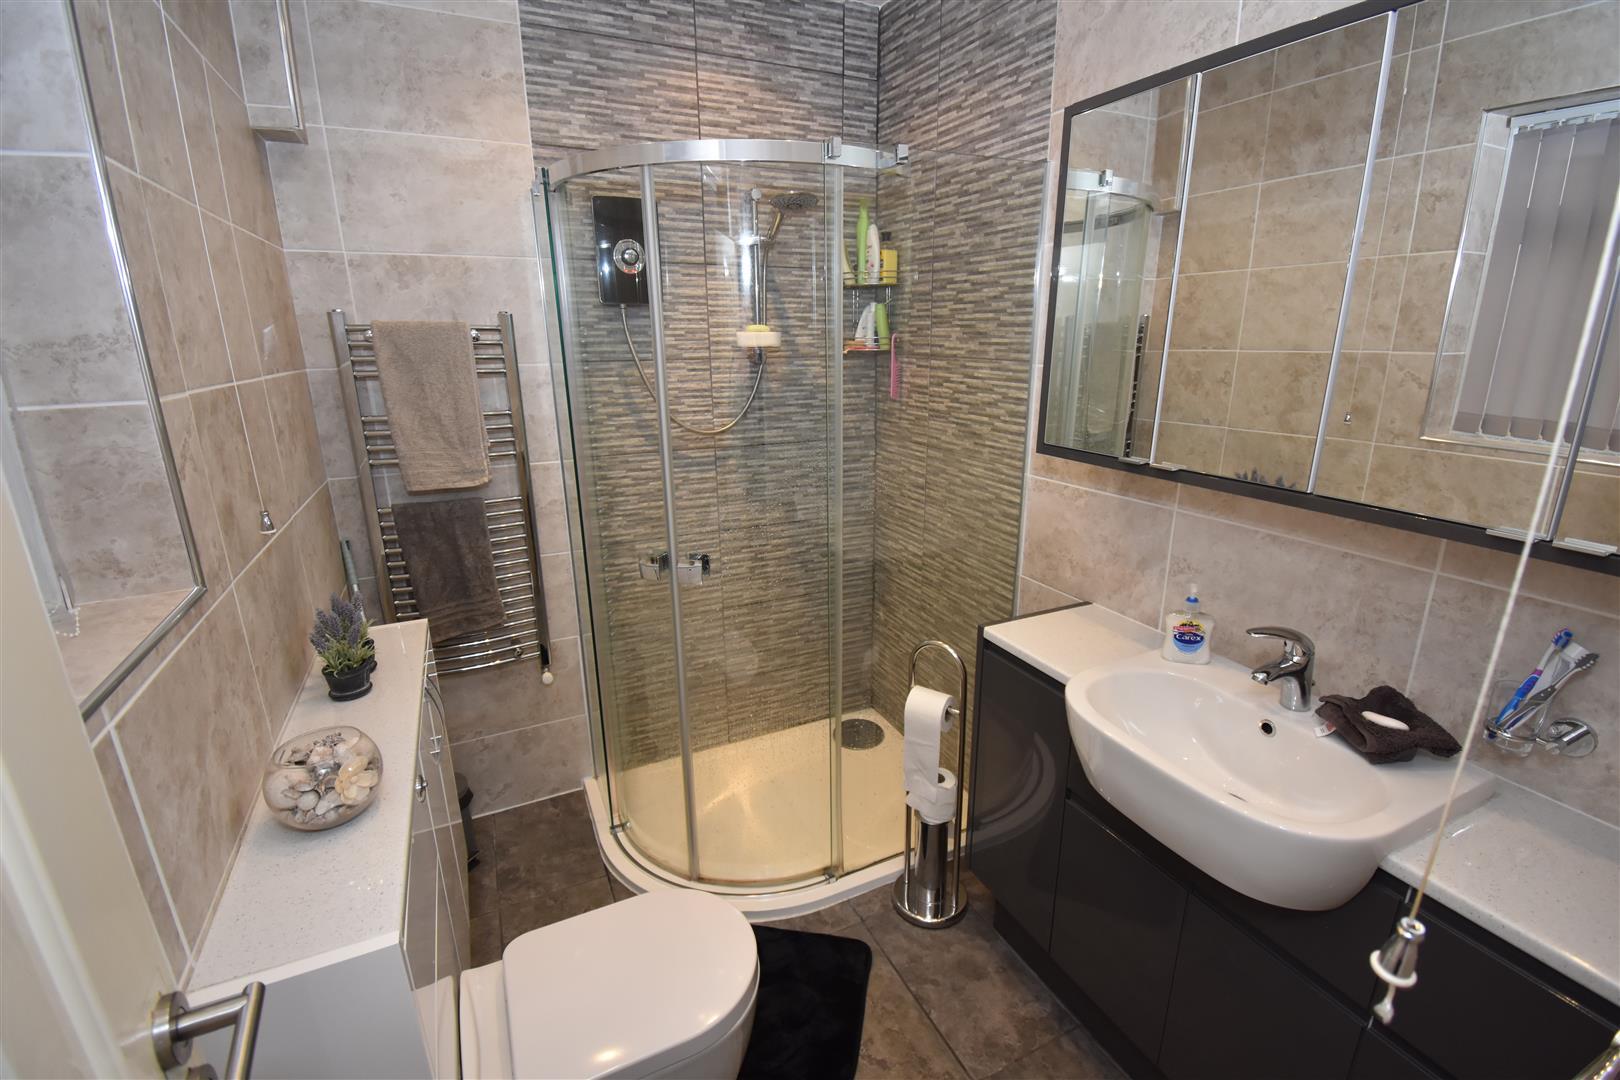 3 bed house for sale in Drews Lane, Birmingham B8 2SL 3